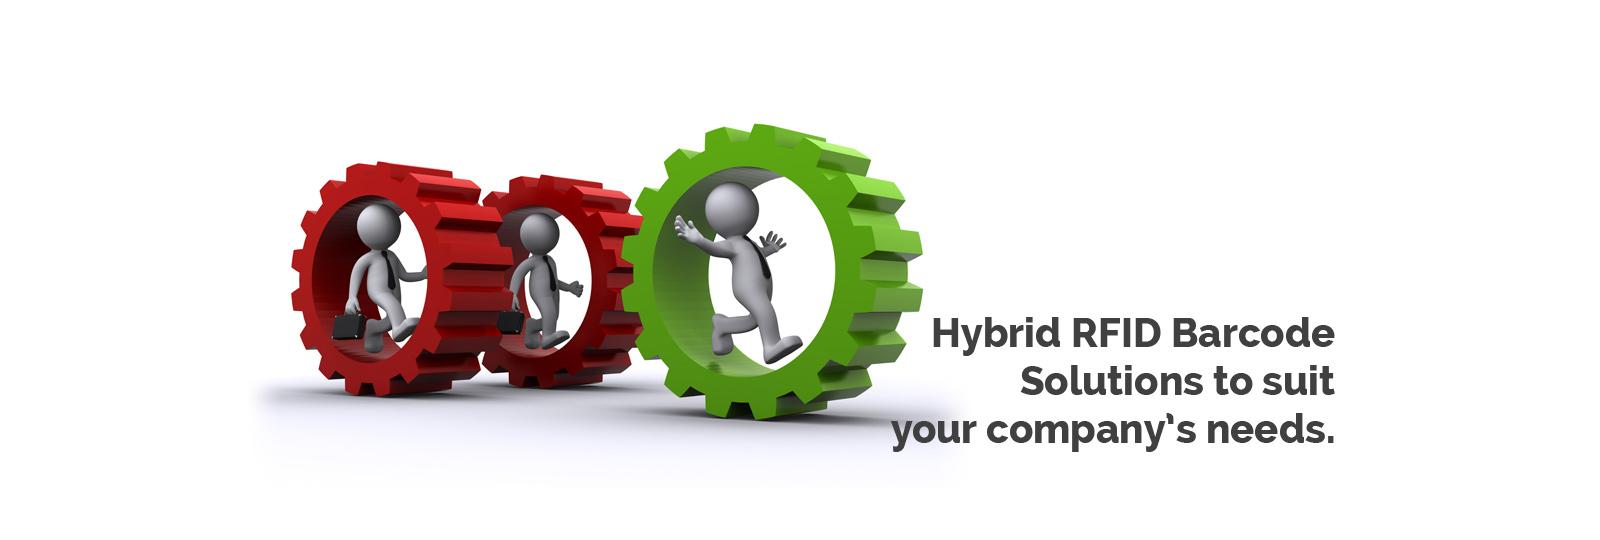 Hybrid RFID Barcode Solutions - Element ID